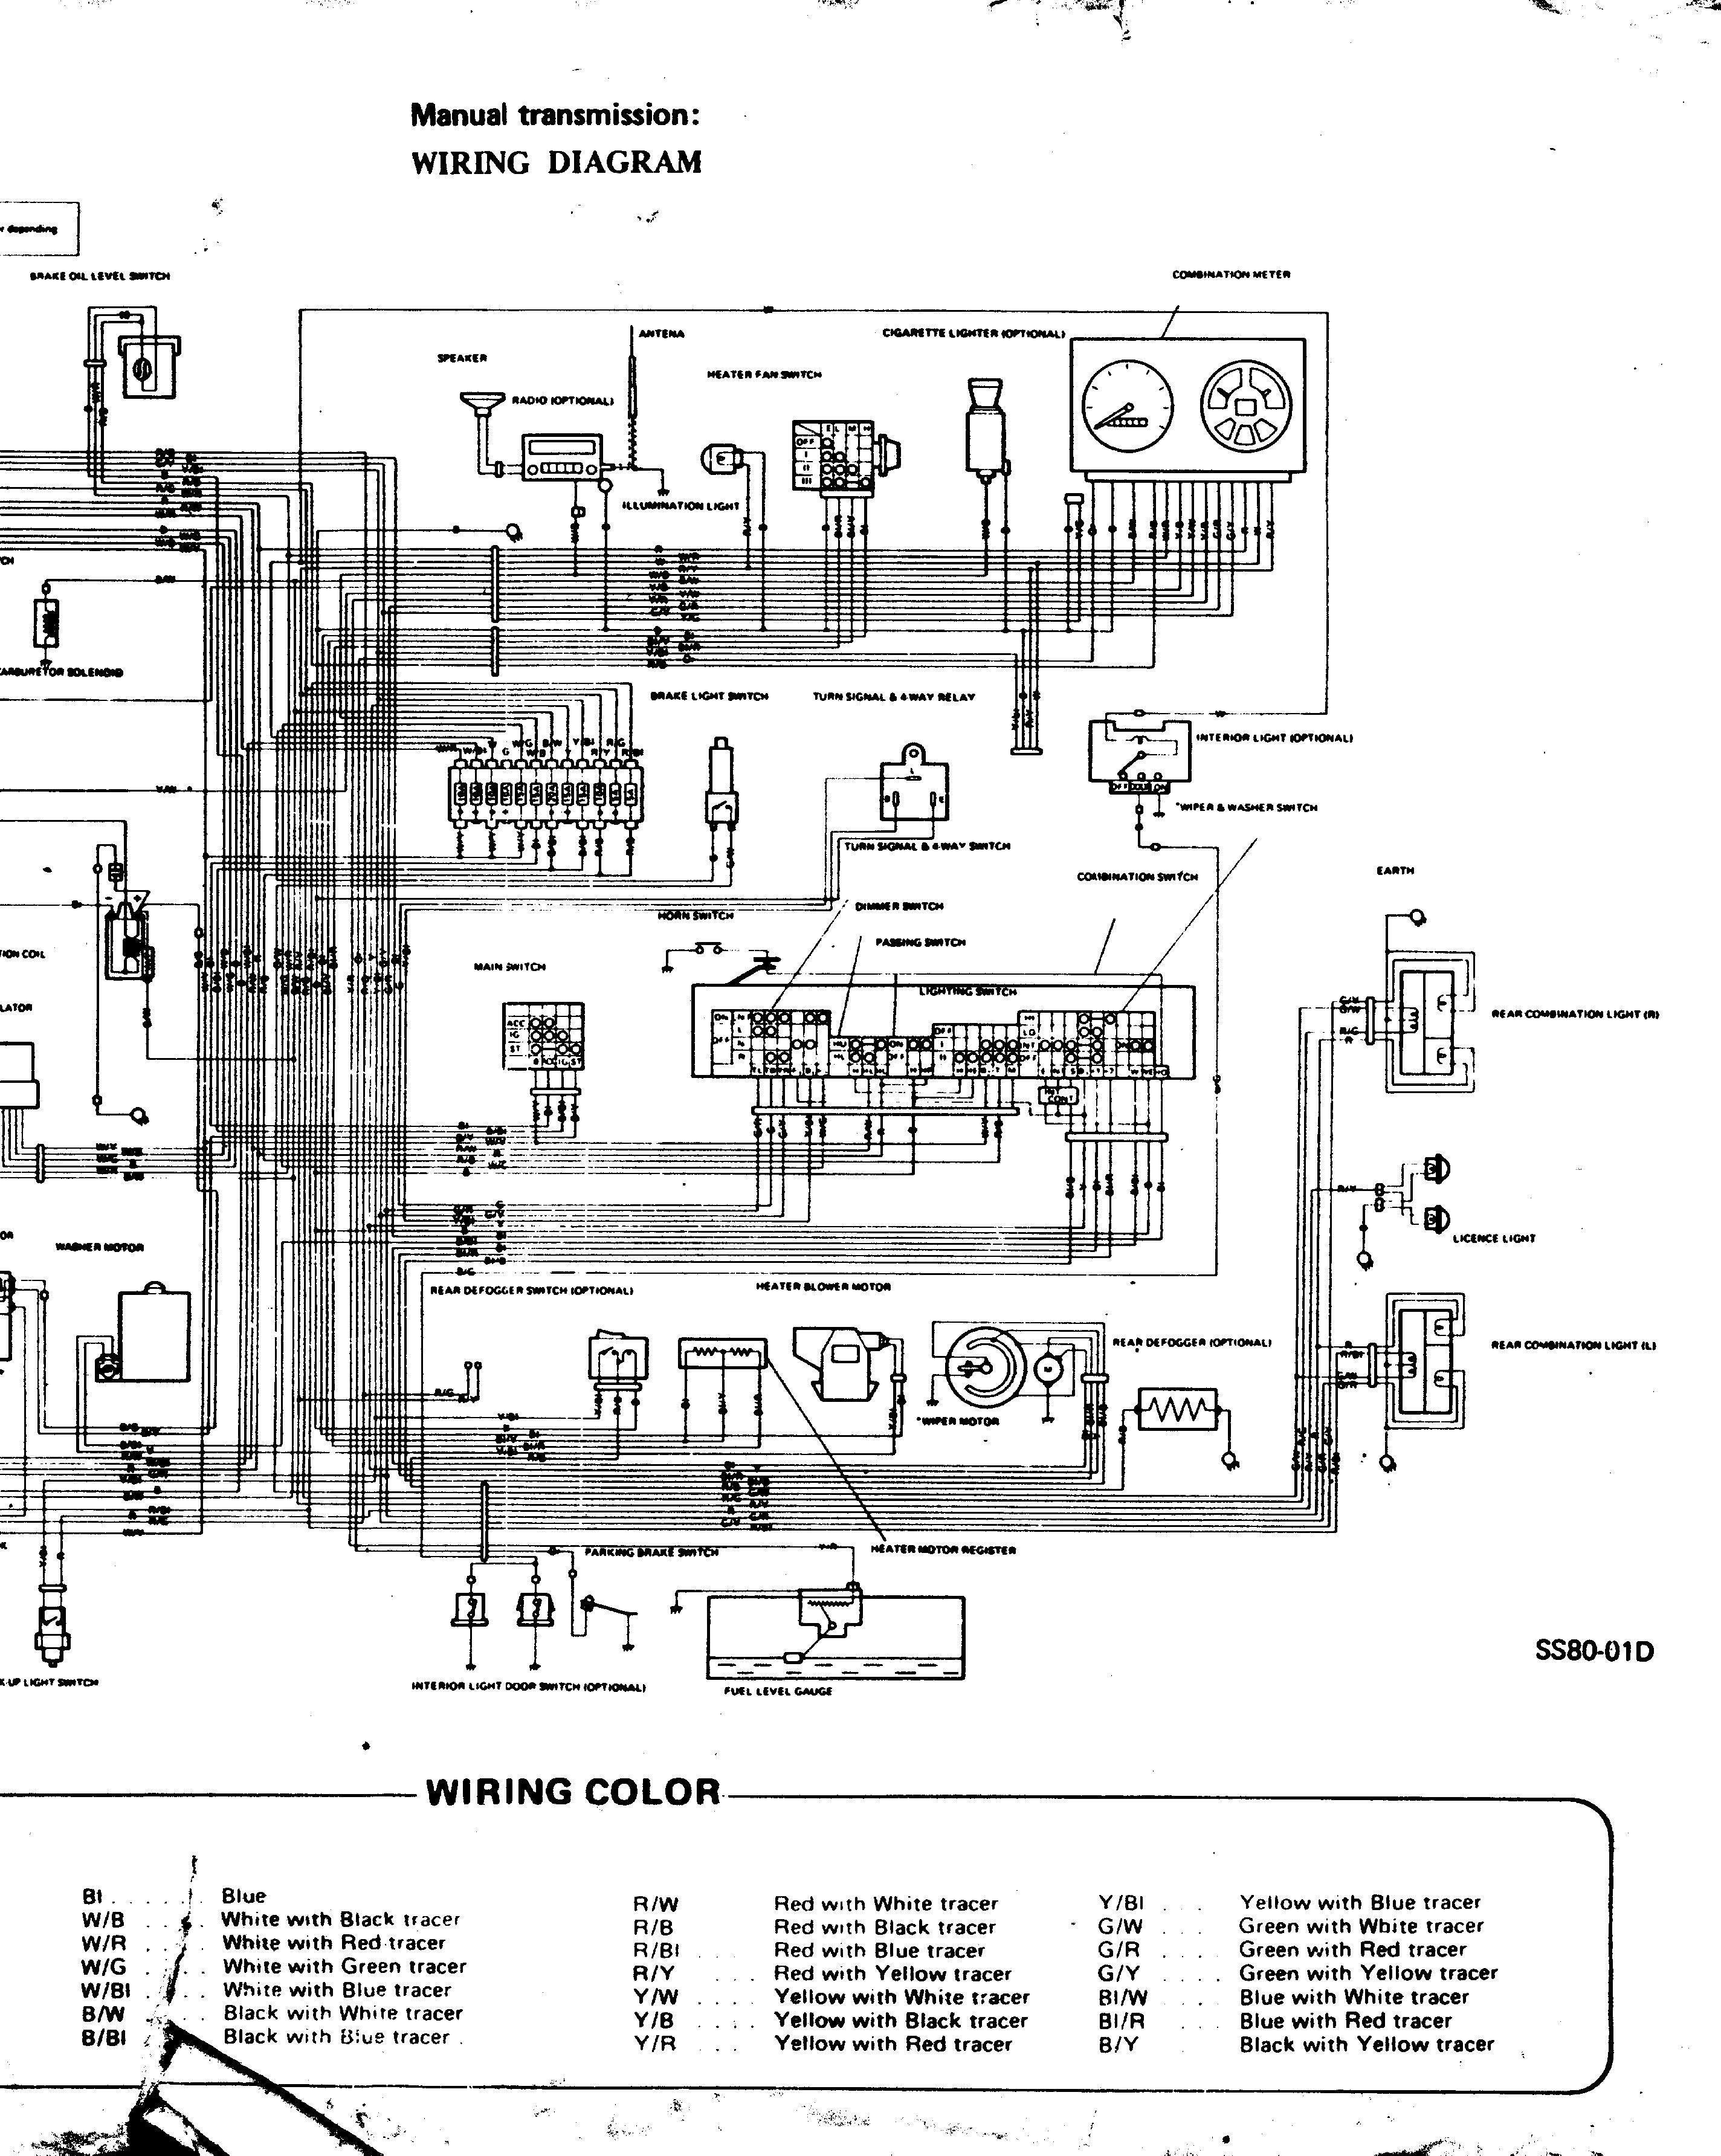 Service & Repair Manuals Automotive 1997 1999 2000 2001 2002 Acura NSX  Electrical Schematic Diagnostic Wiring Manual | Acura Nsx Wiring Diagram |  | Recamier